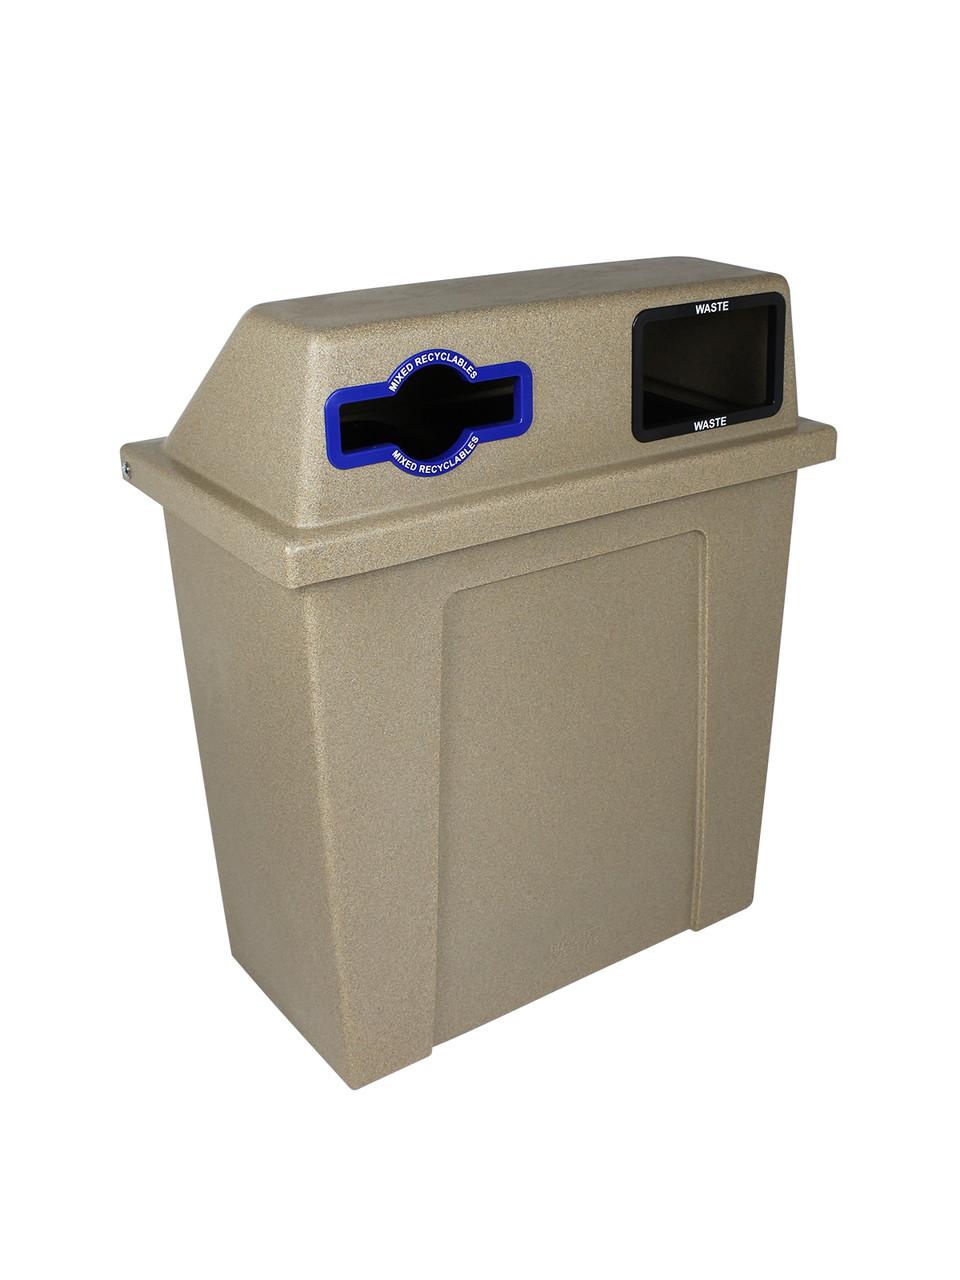 64 Gallon Plastic Dual 2 in 1 Recycling Bin Sandstone 101434